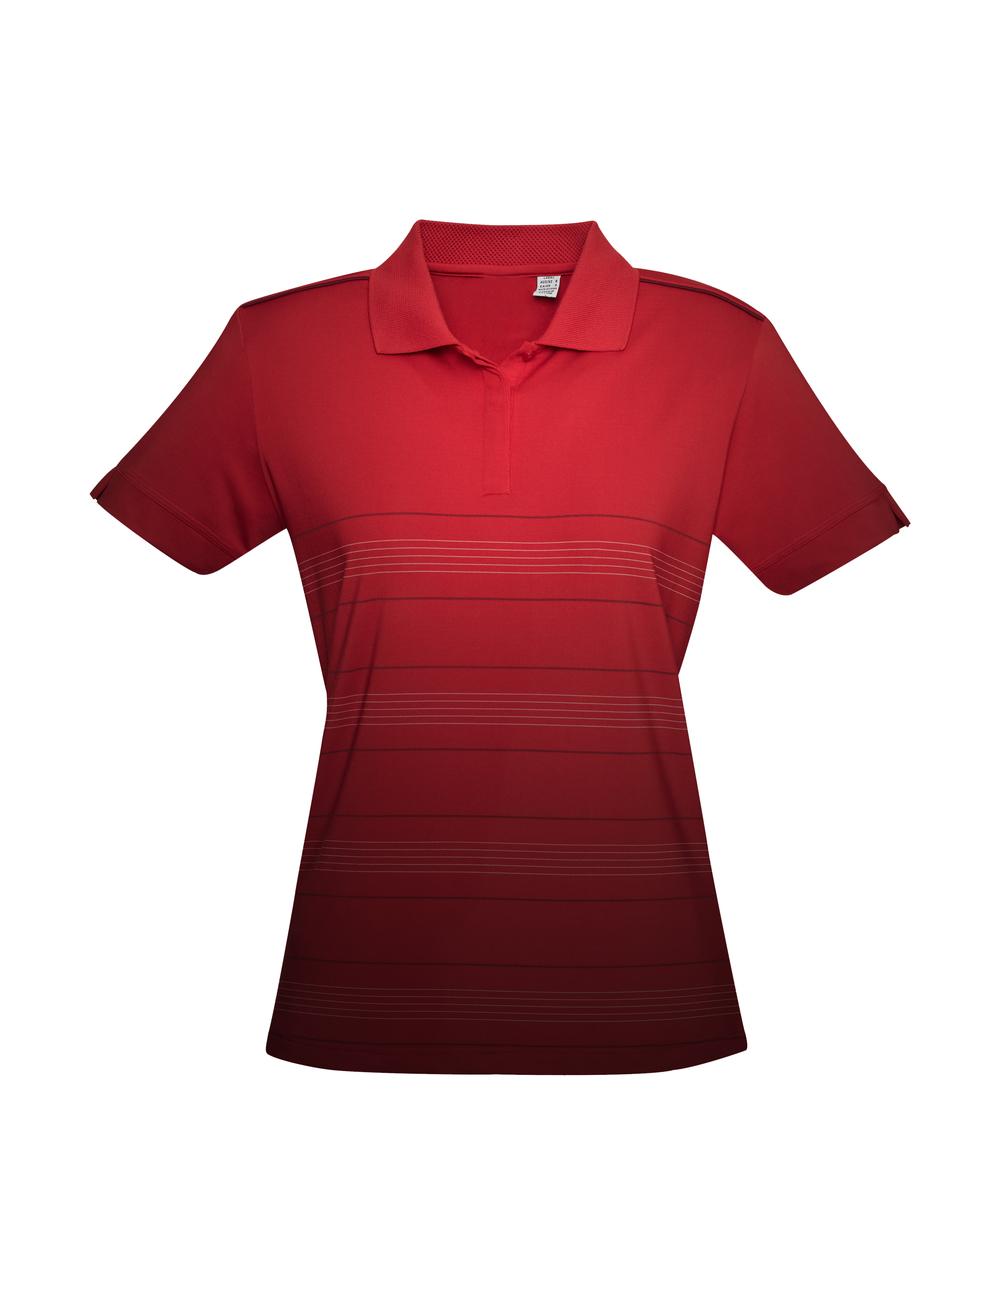 Custom Work Polo Shirts Australia